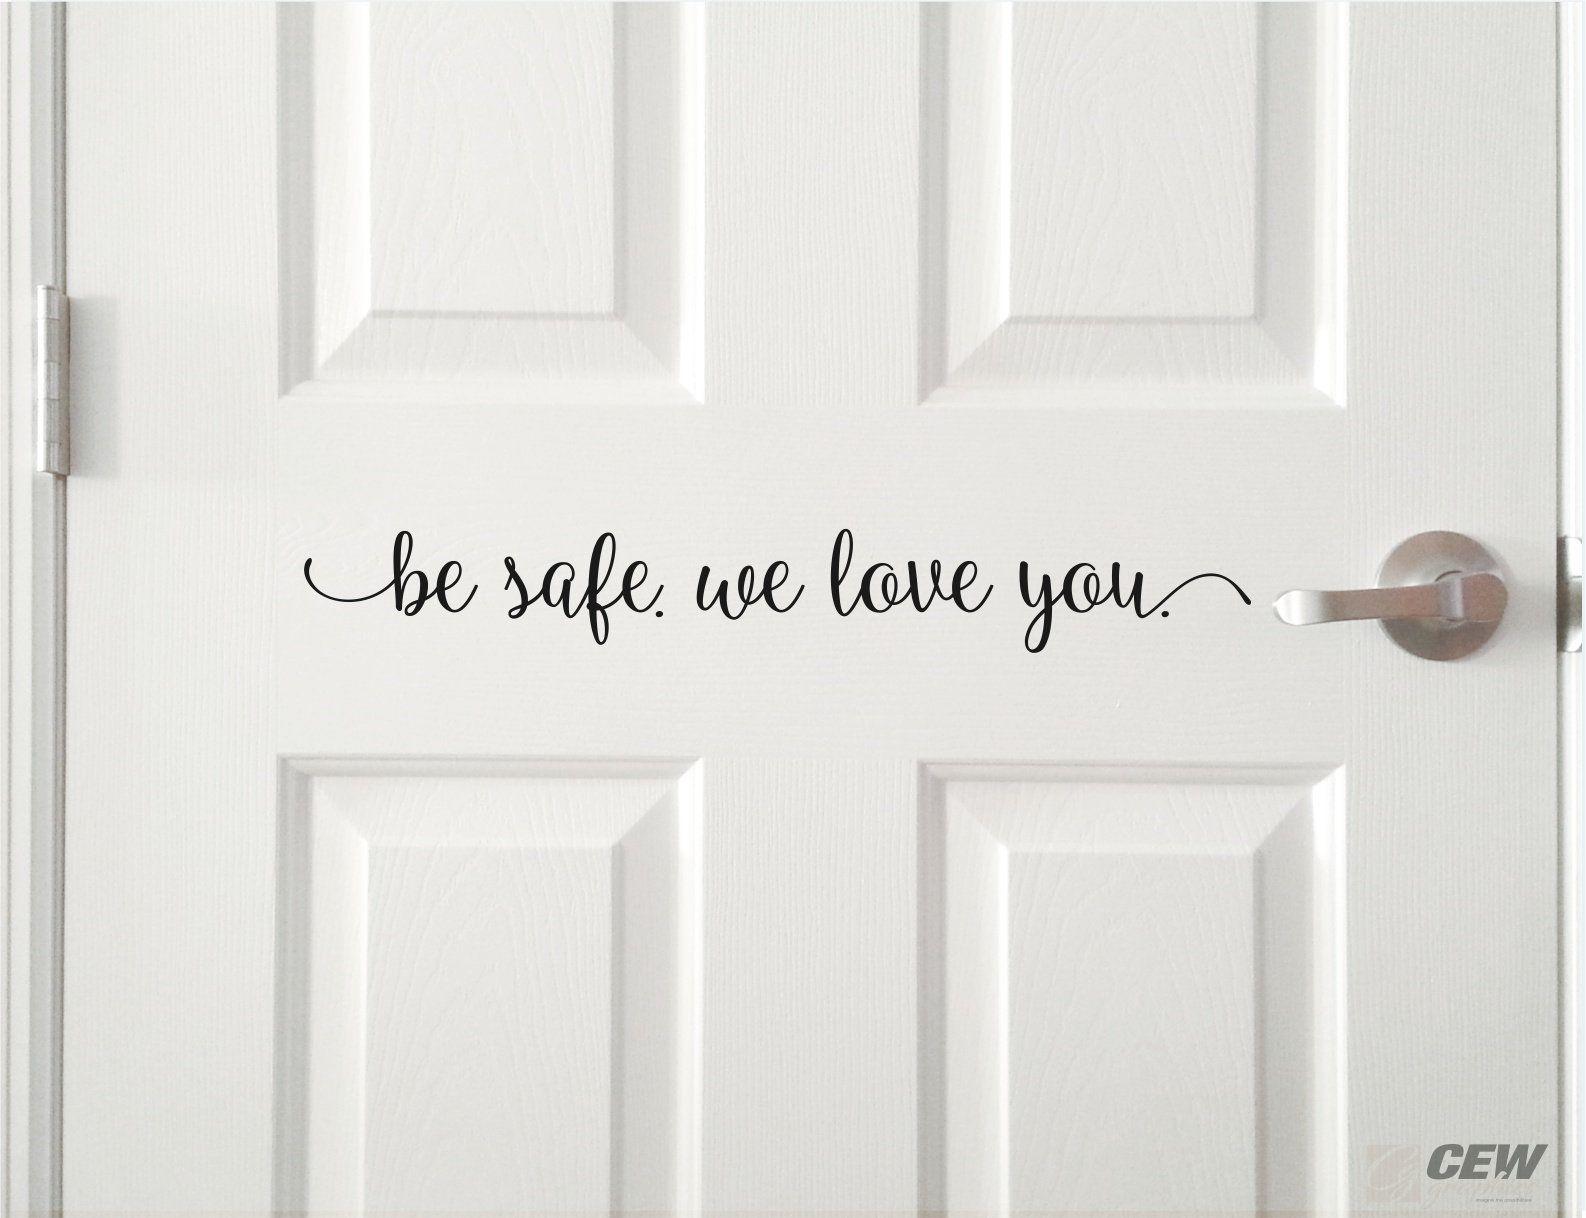 Be Safe We Love You Decal Come Home Safe Decal House Door Etsy In 2021 Front Door Decal Kitchen Vinyl Decals Bathroom Wall Decals